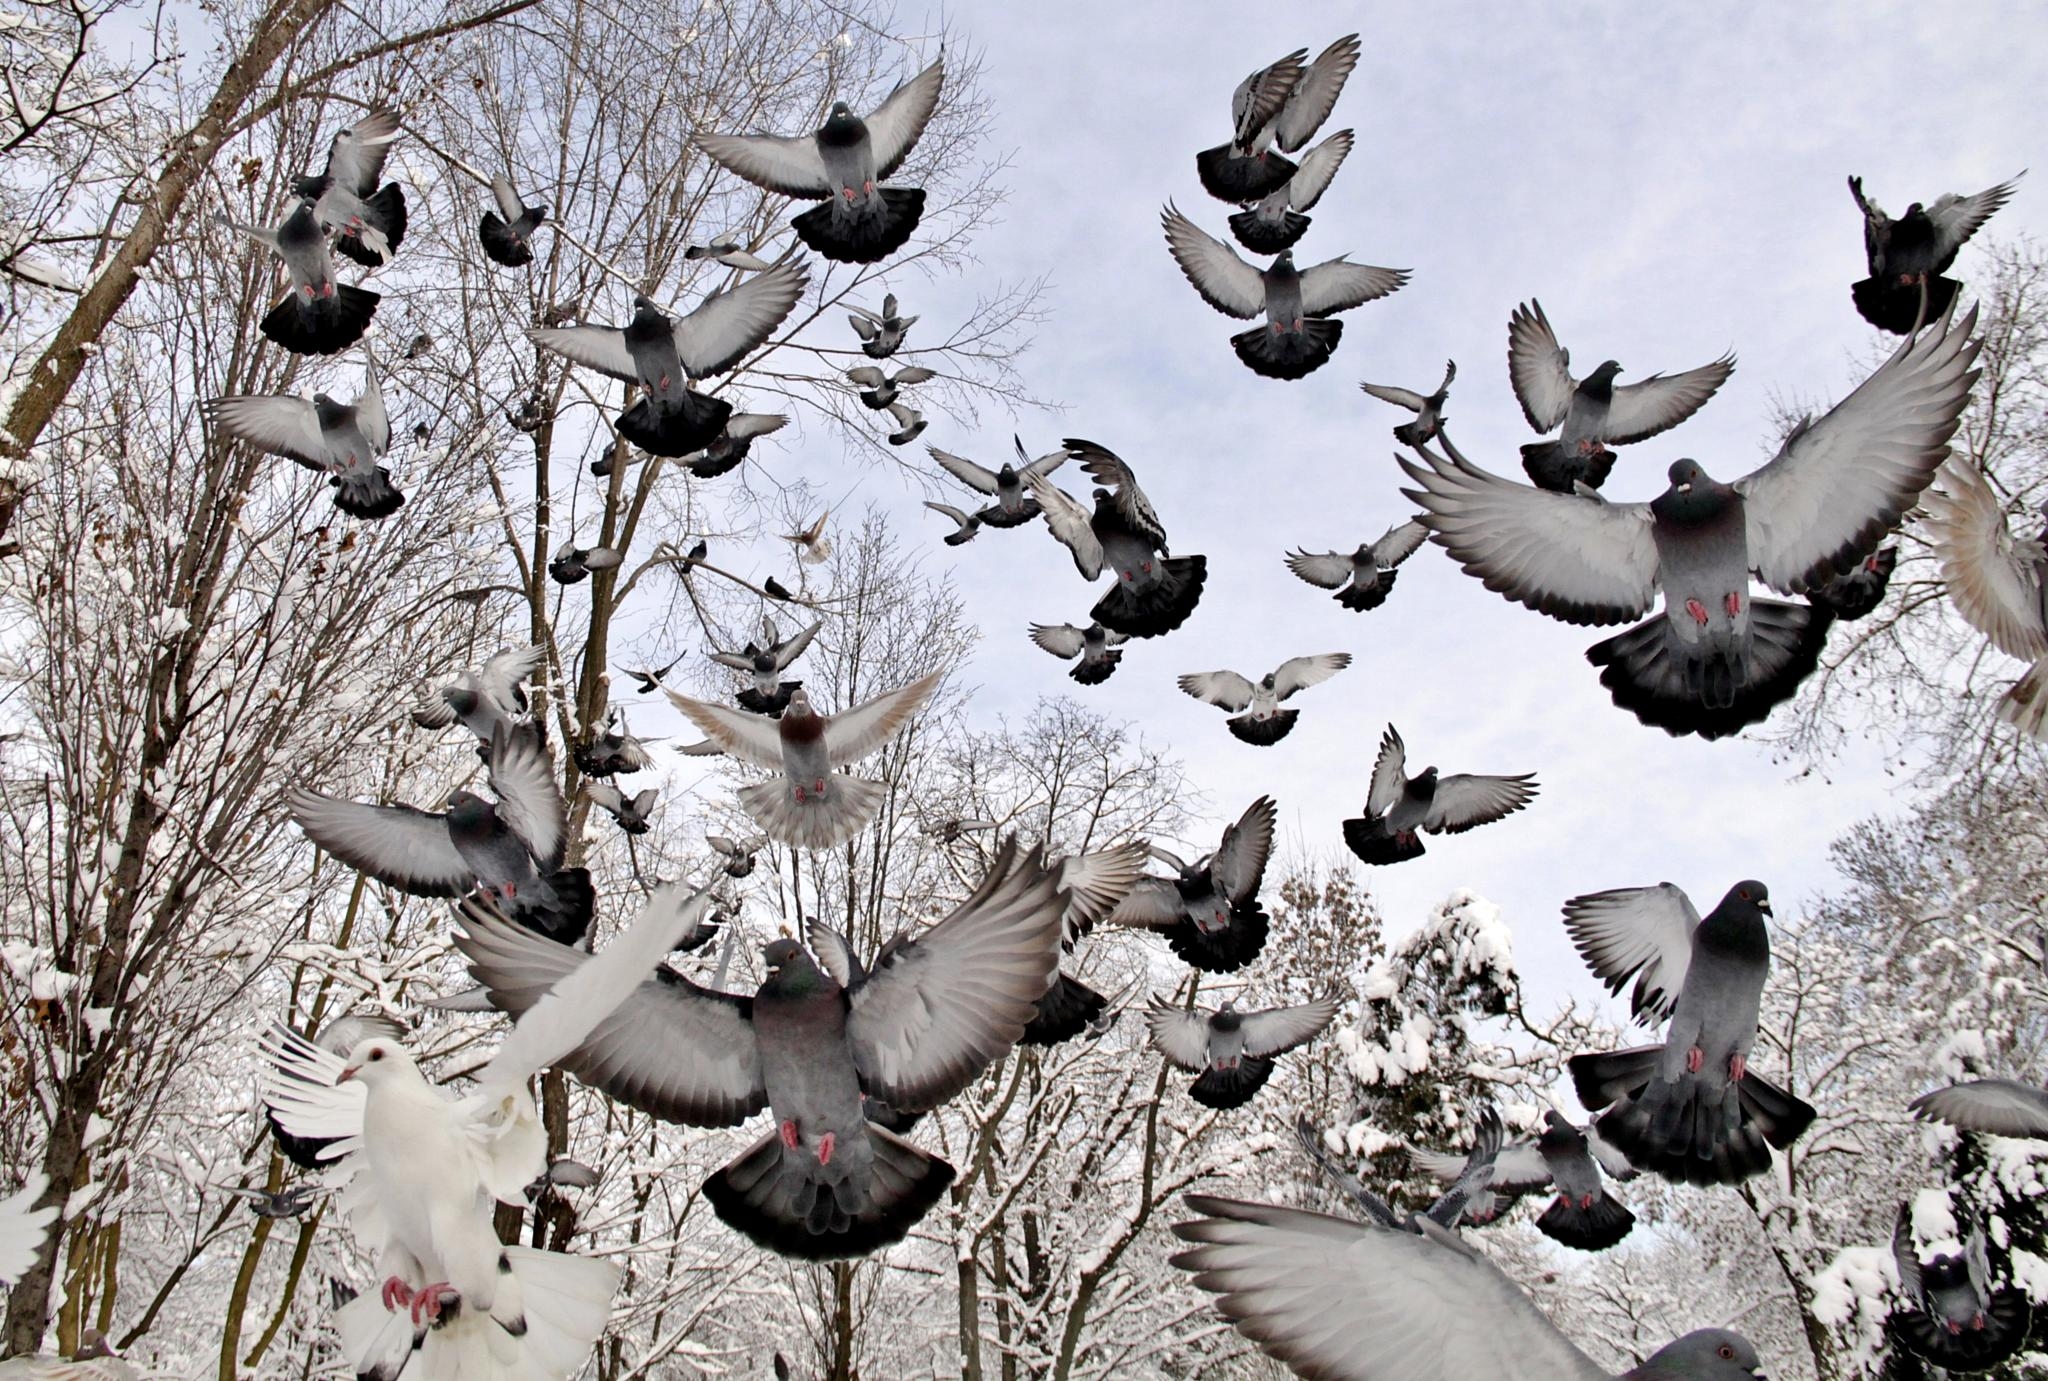 Flight by Sorin Panait